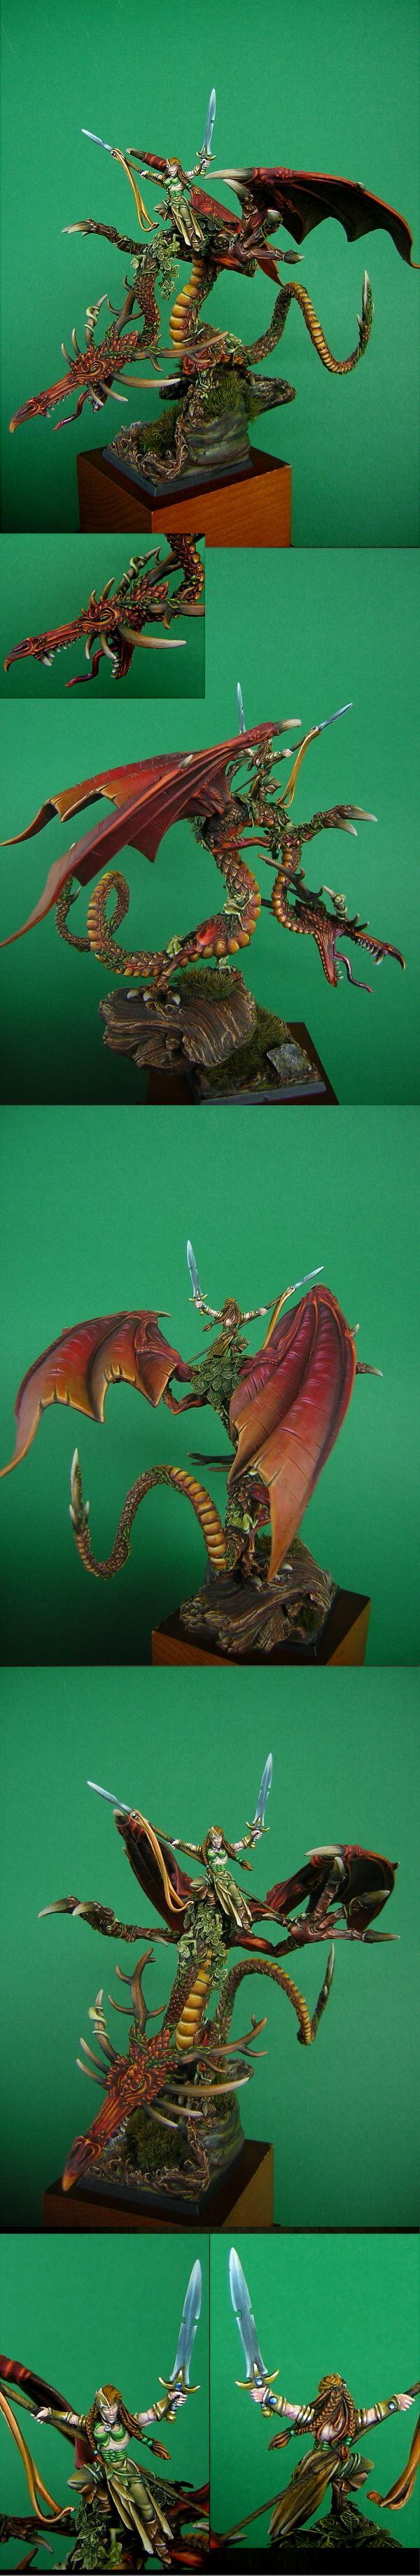 Dragon, Wood Elves, FAFNIR the Forrest Dragon